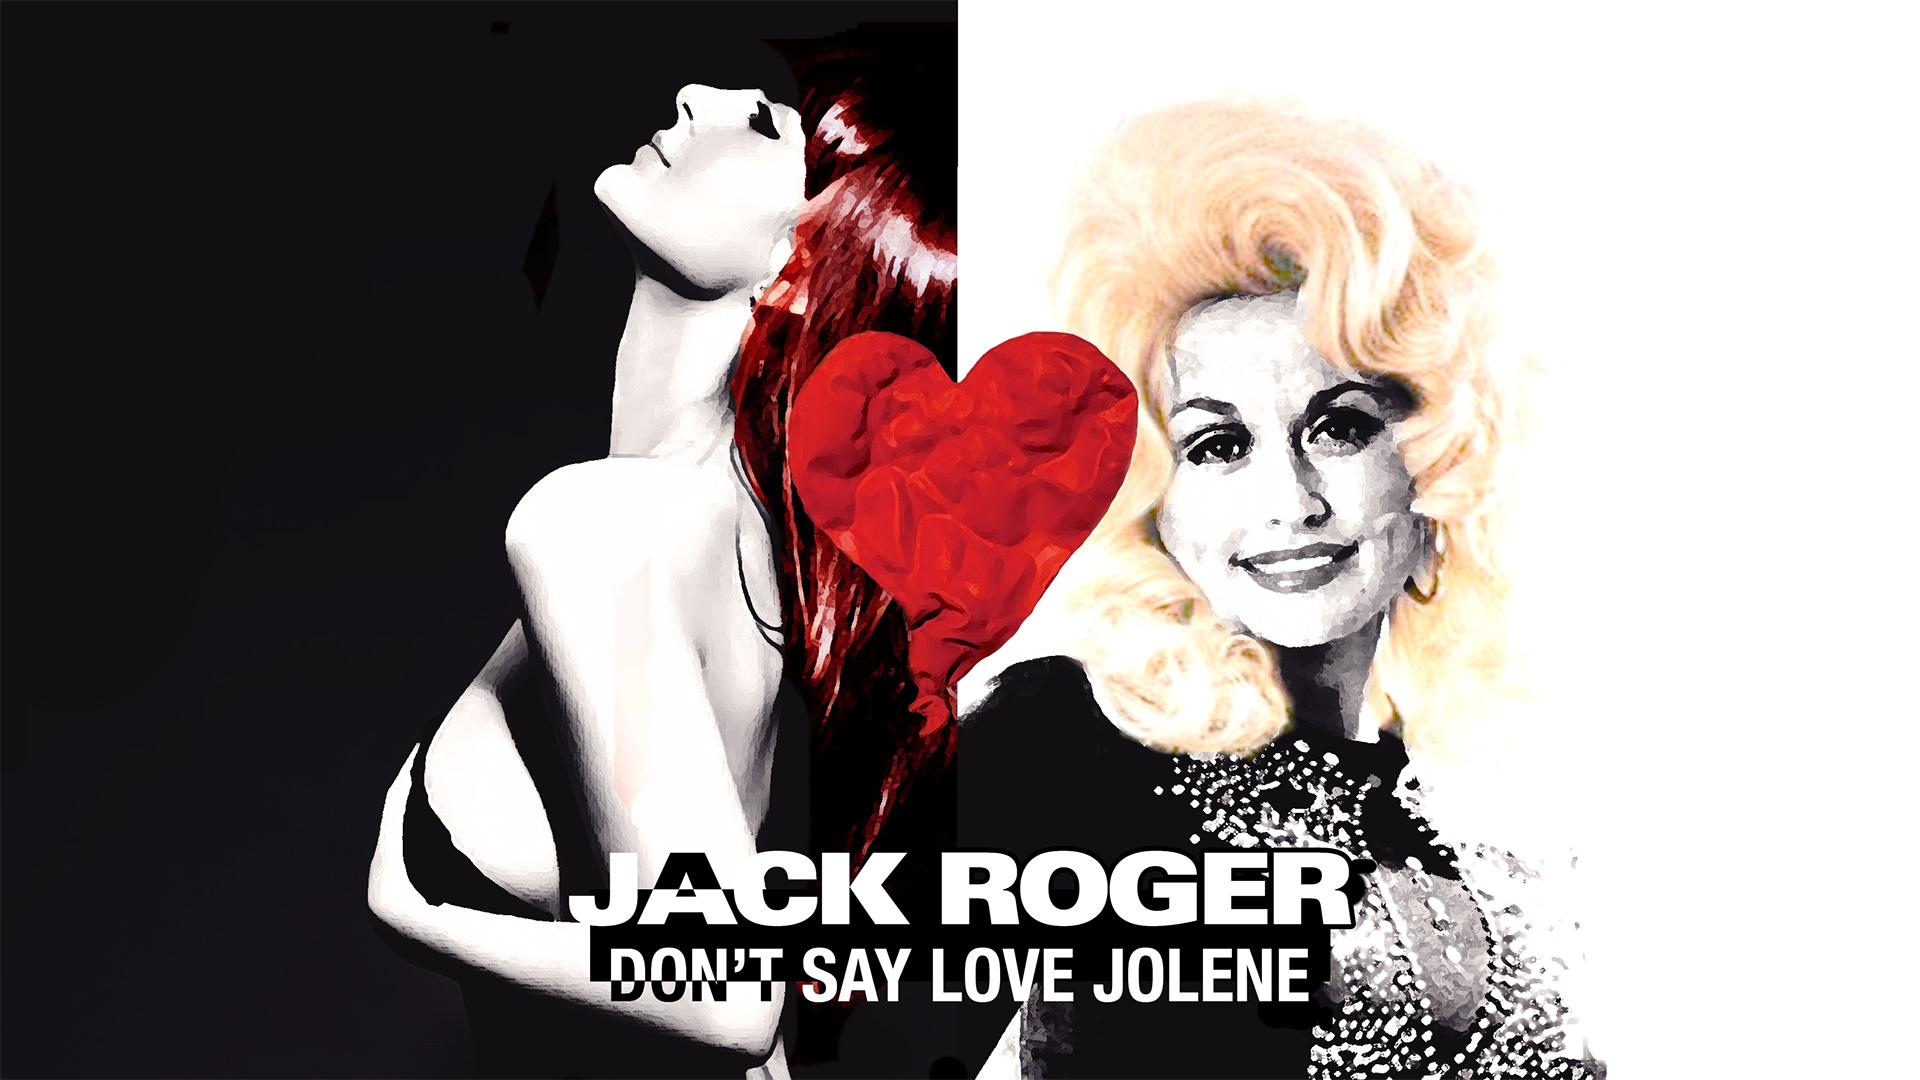 08-Don't-Say-Love-Jolene-widescreen